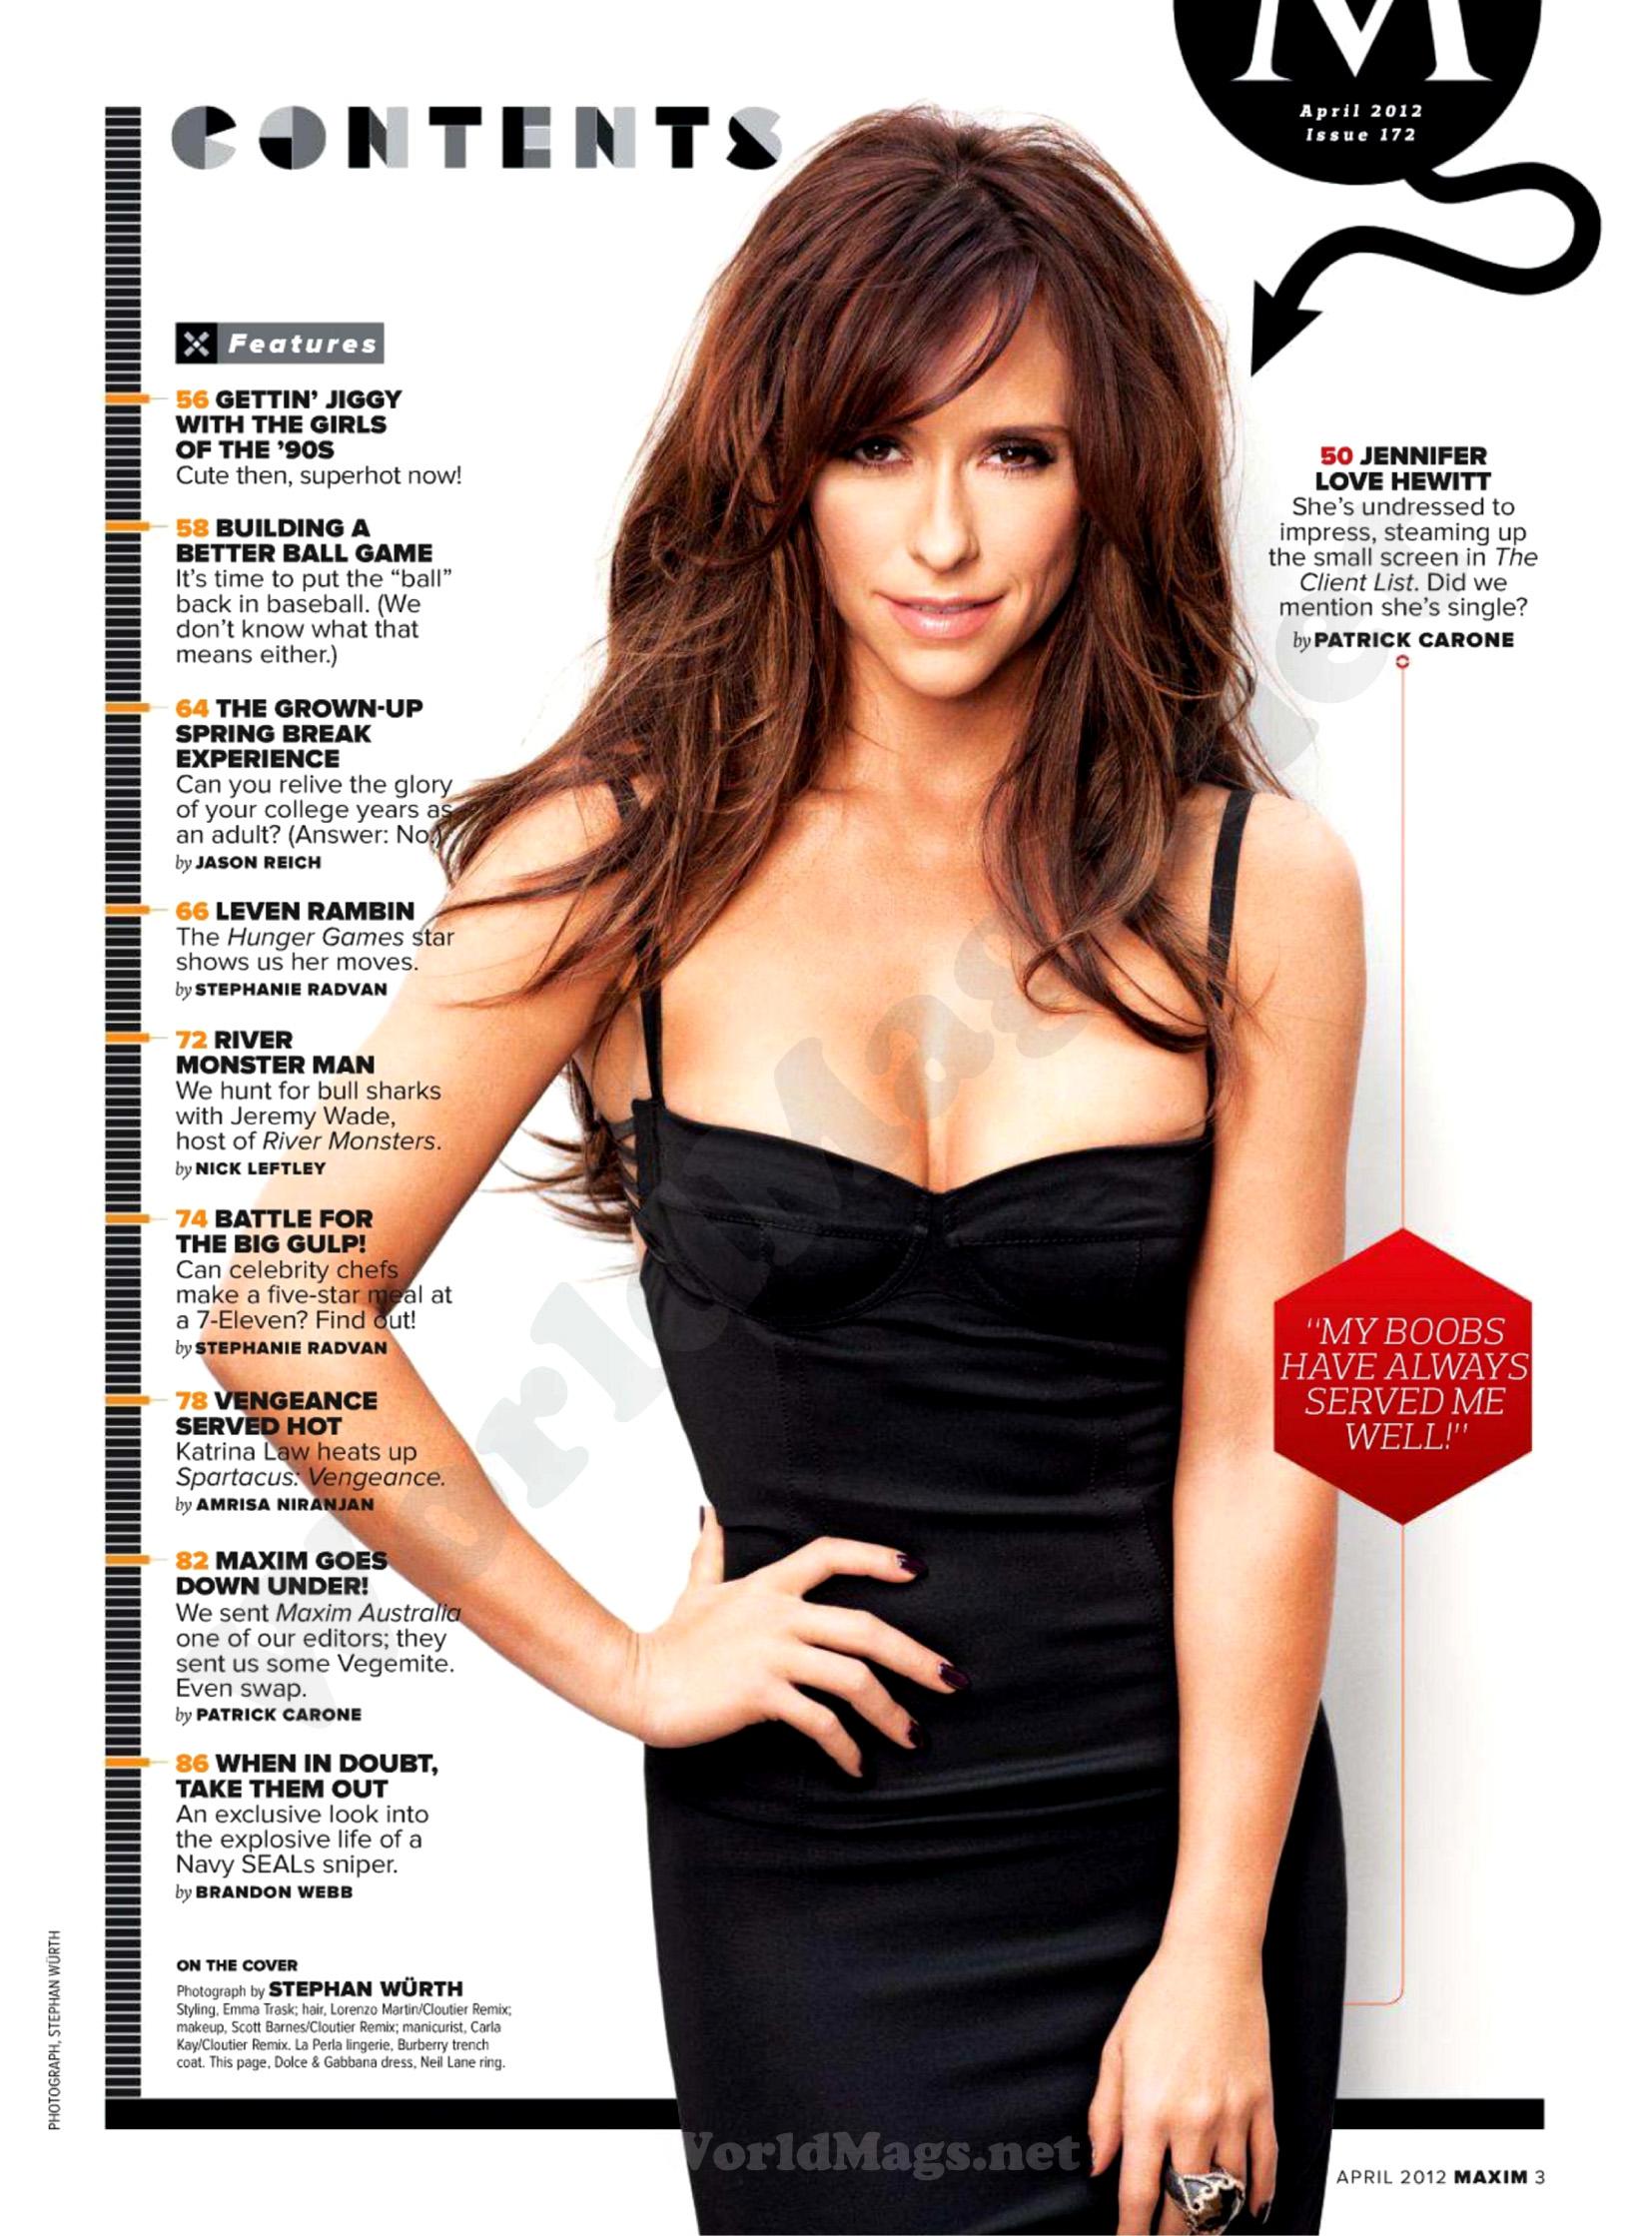 Jennifer Love Hewitt 2013 : Jennifer Love Hewitt – Maxim 2012 -20